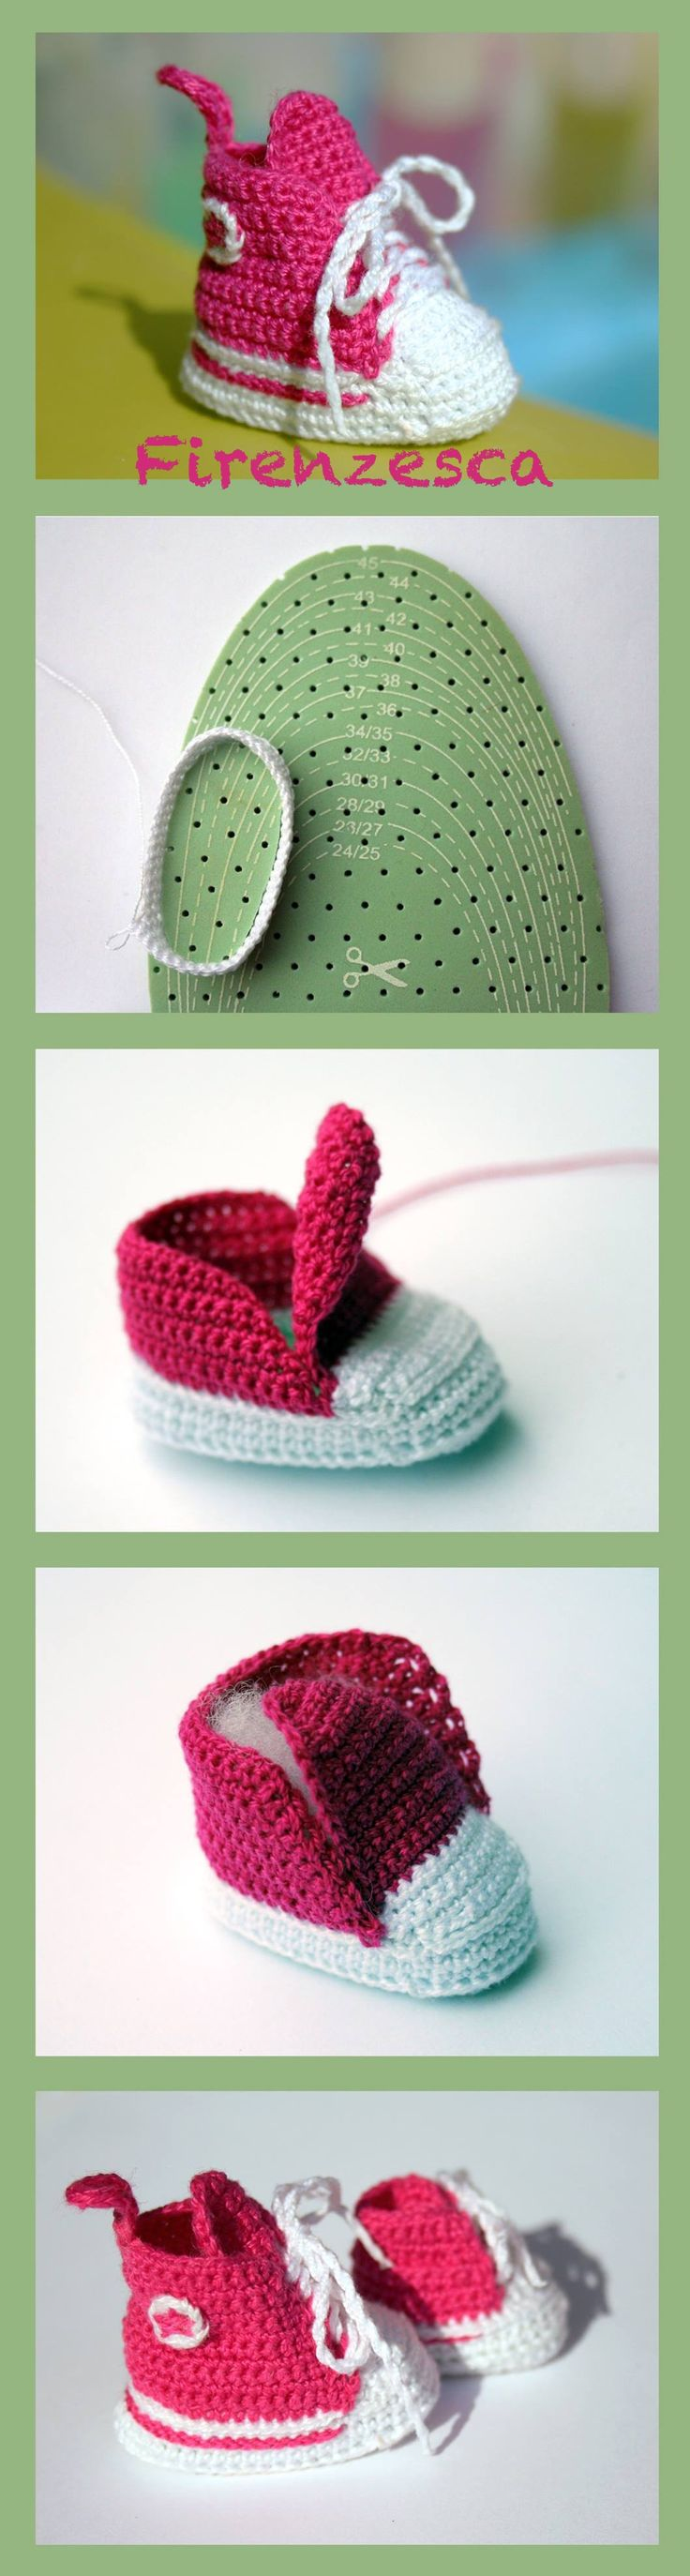 "sneakers converse allstars crochet amigurumi shoes keychain scarpine portachiavi uncinetto pink ""Francesca Birini"""